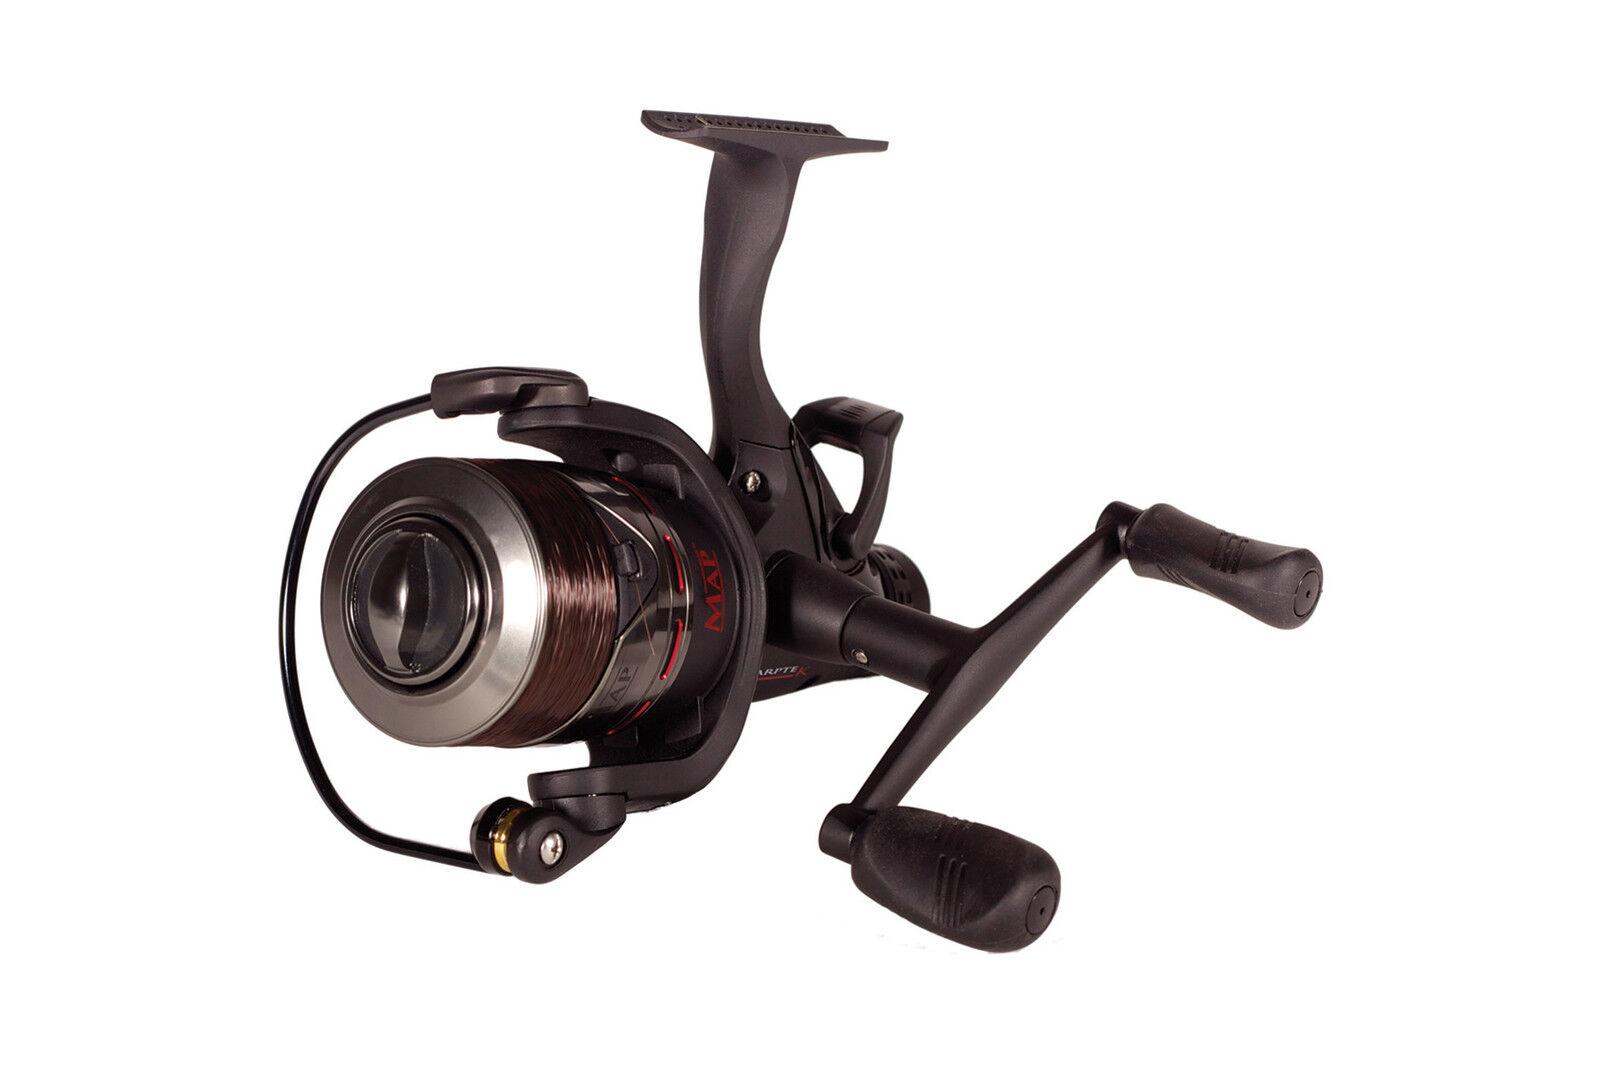 MAP Carptek ACS 4000 4000 4000 FS Reel   Course Carp Fishing   C0905   Leeda 91fa0e